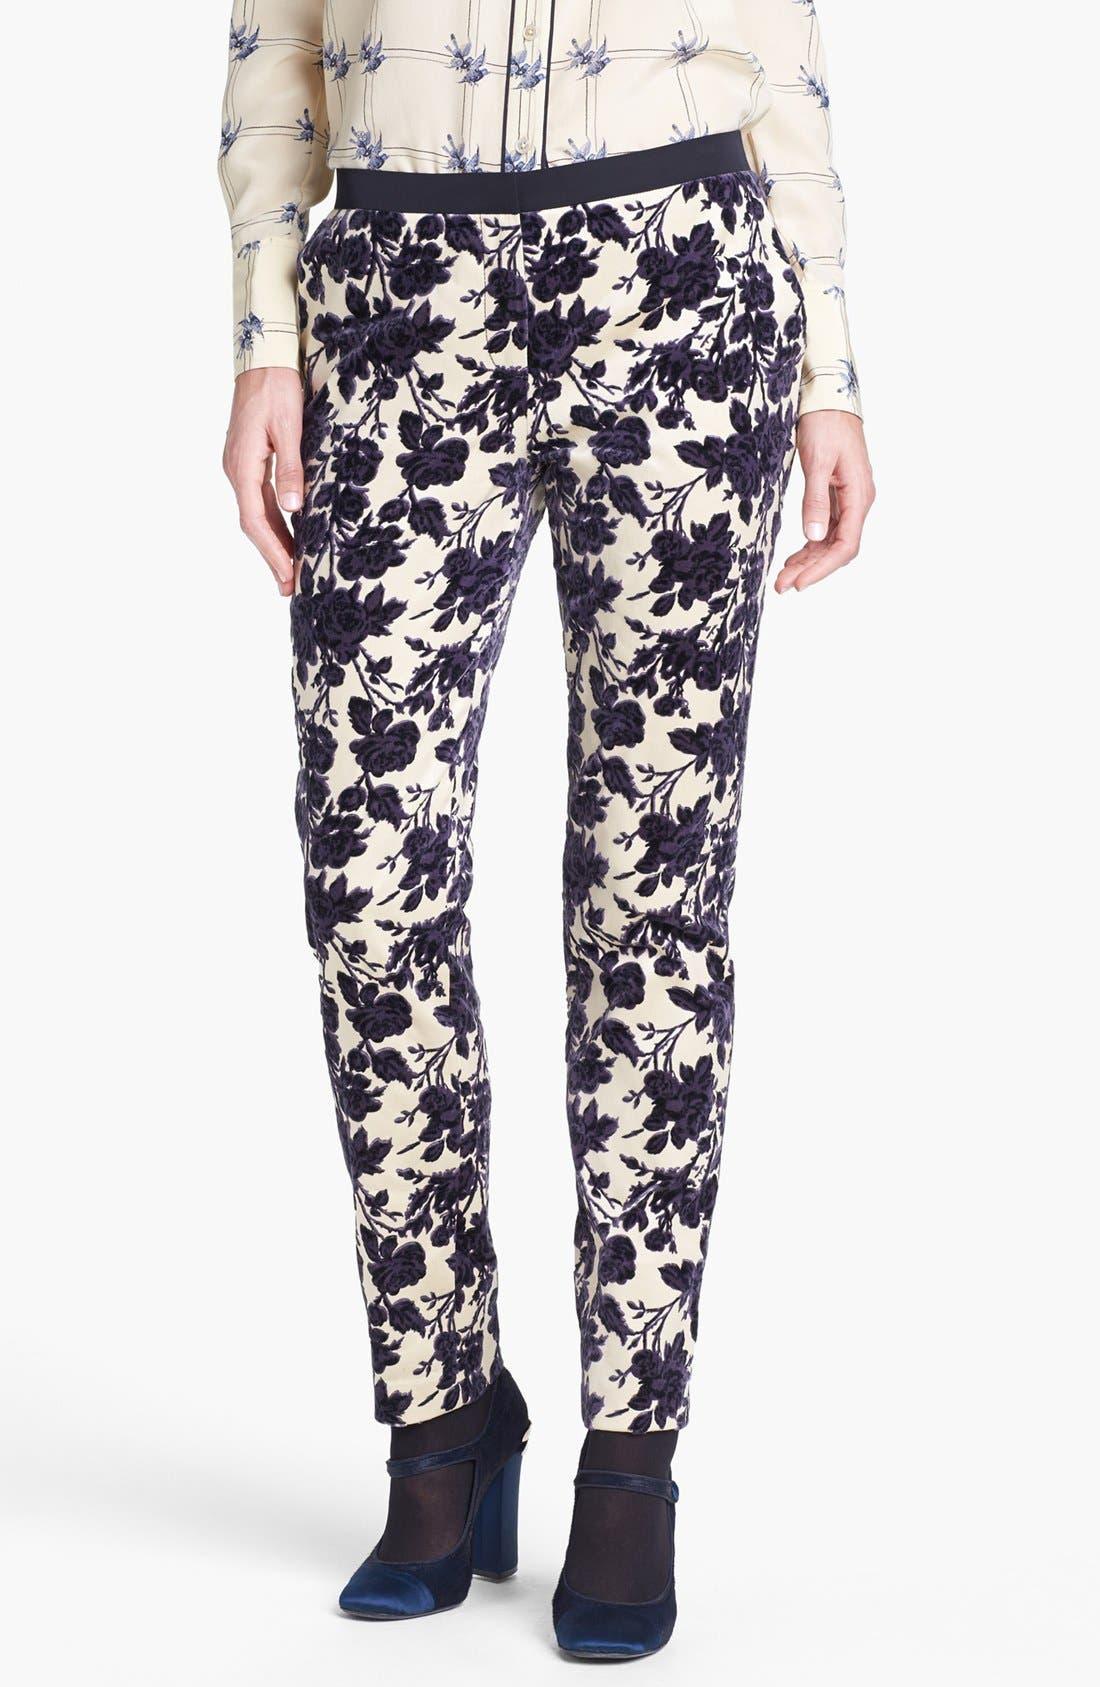 Alternate Image 1 Selected - Tory Burch 'Dayton' Pants